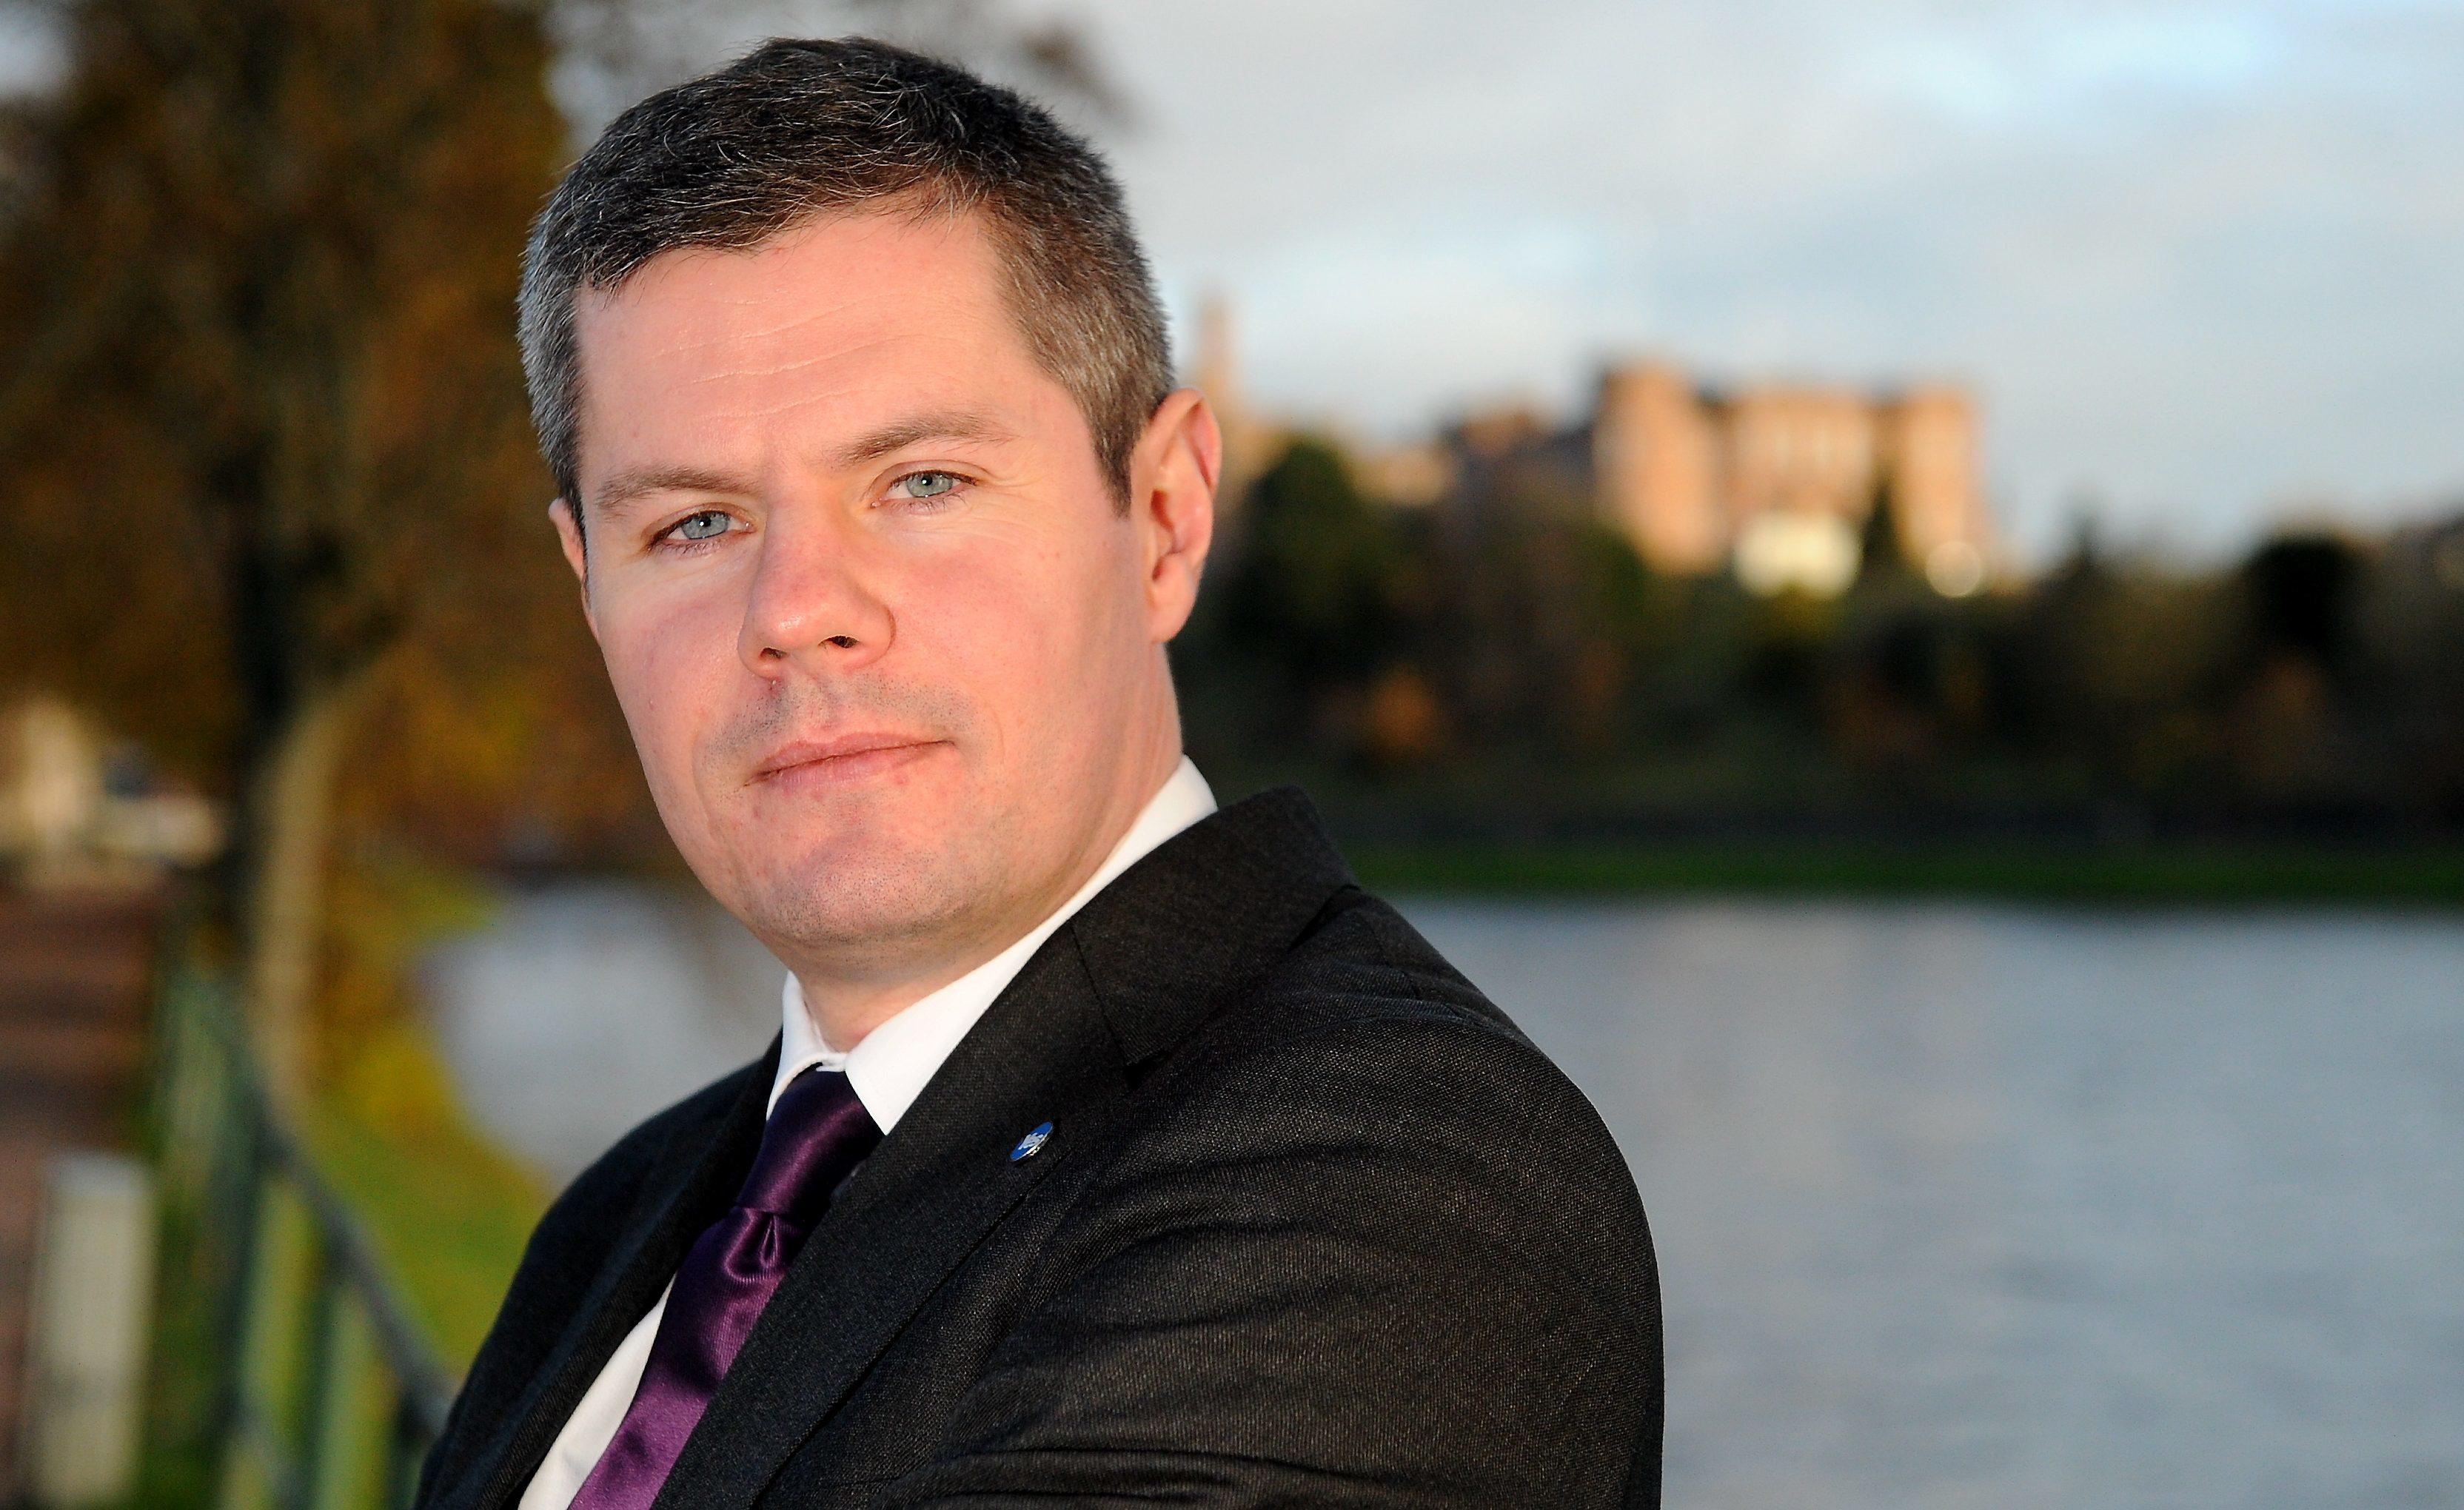 Scotland's Finance Secretary Derek Mackay will be in the city on Friday.